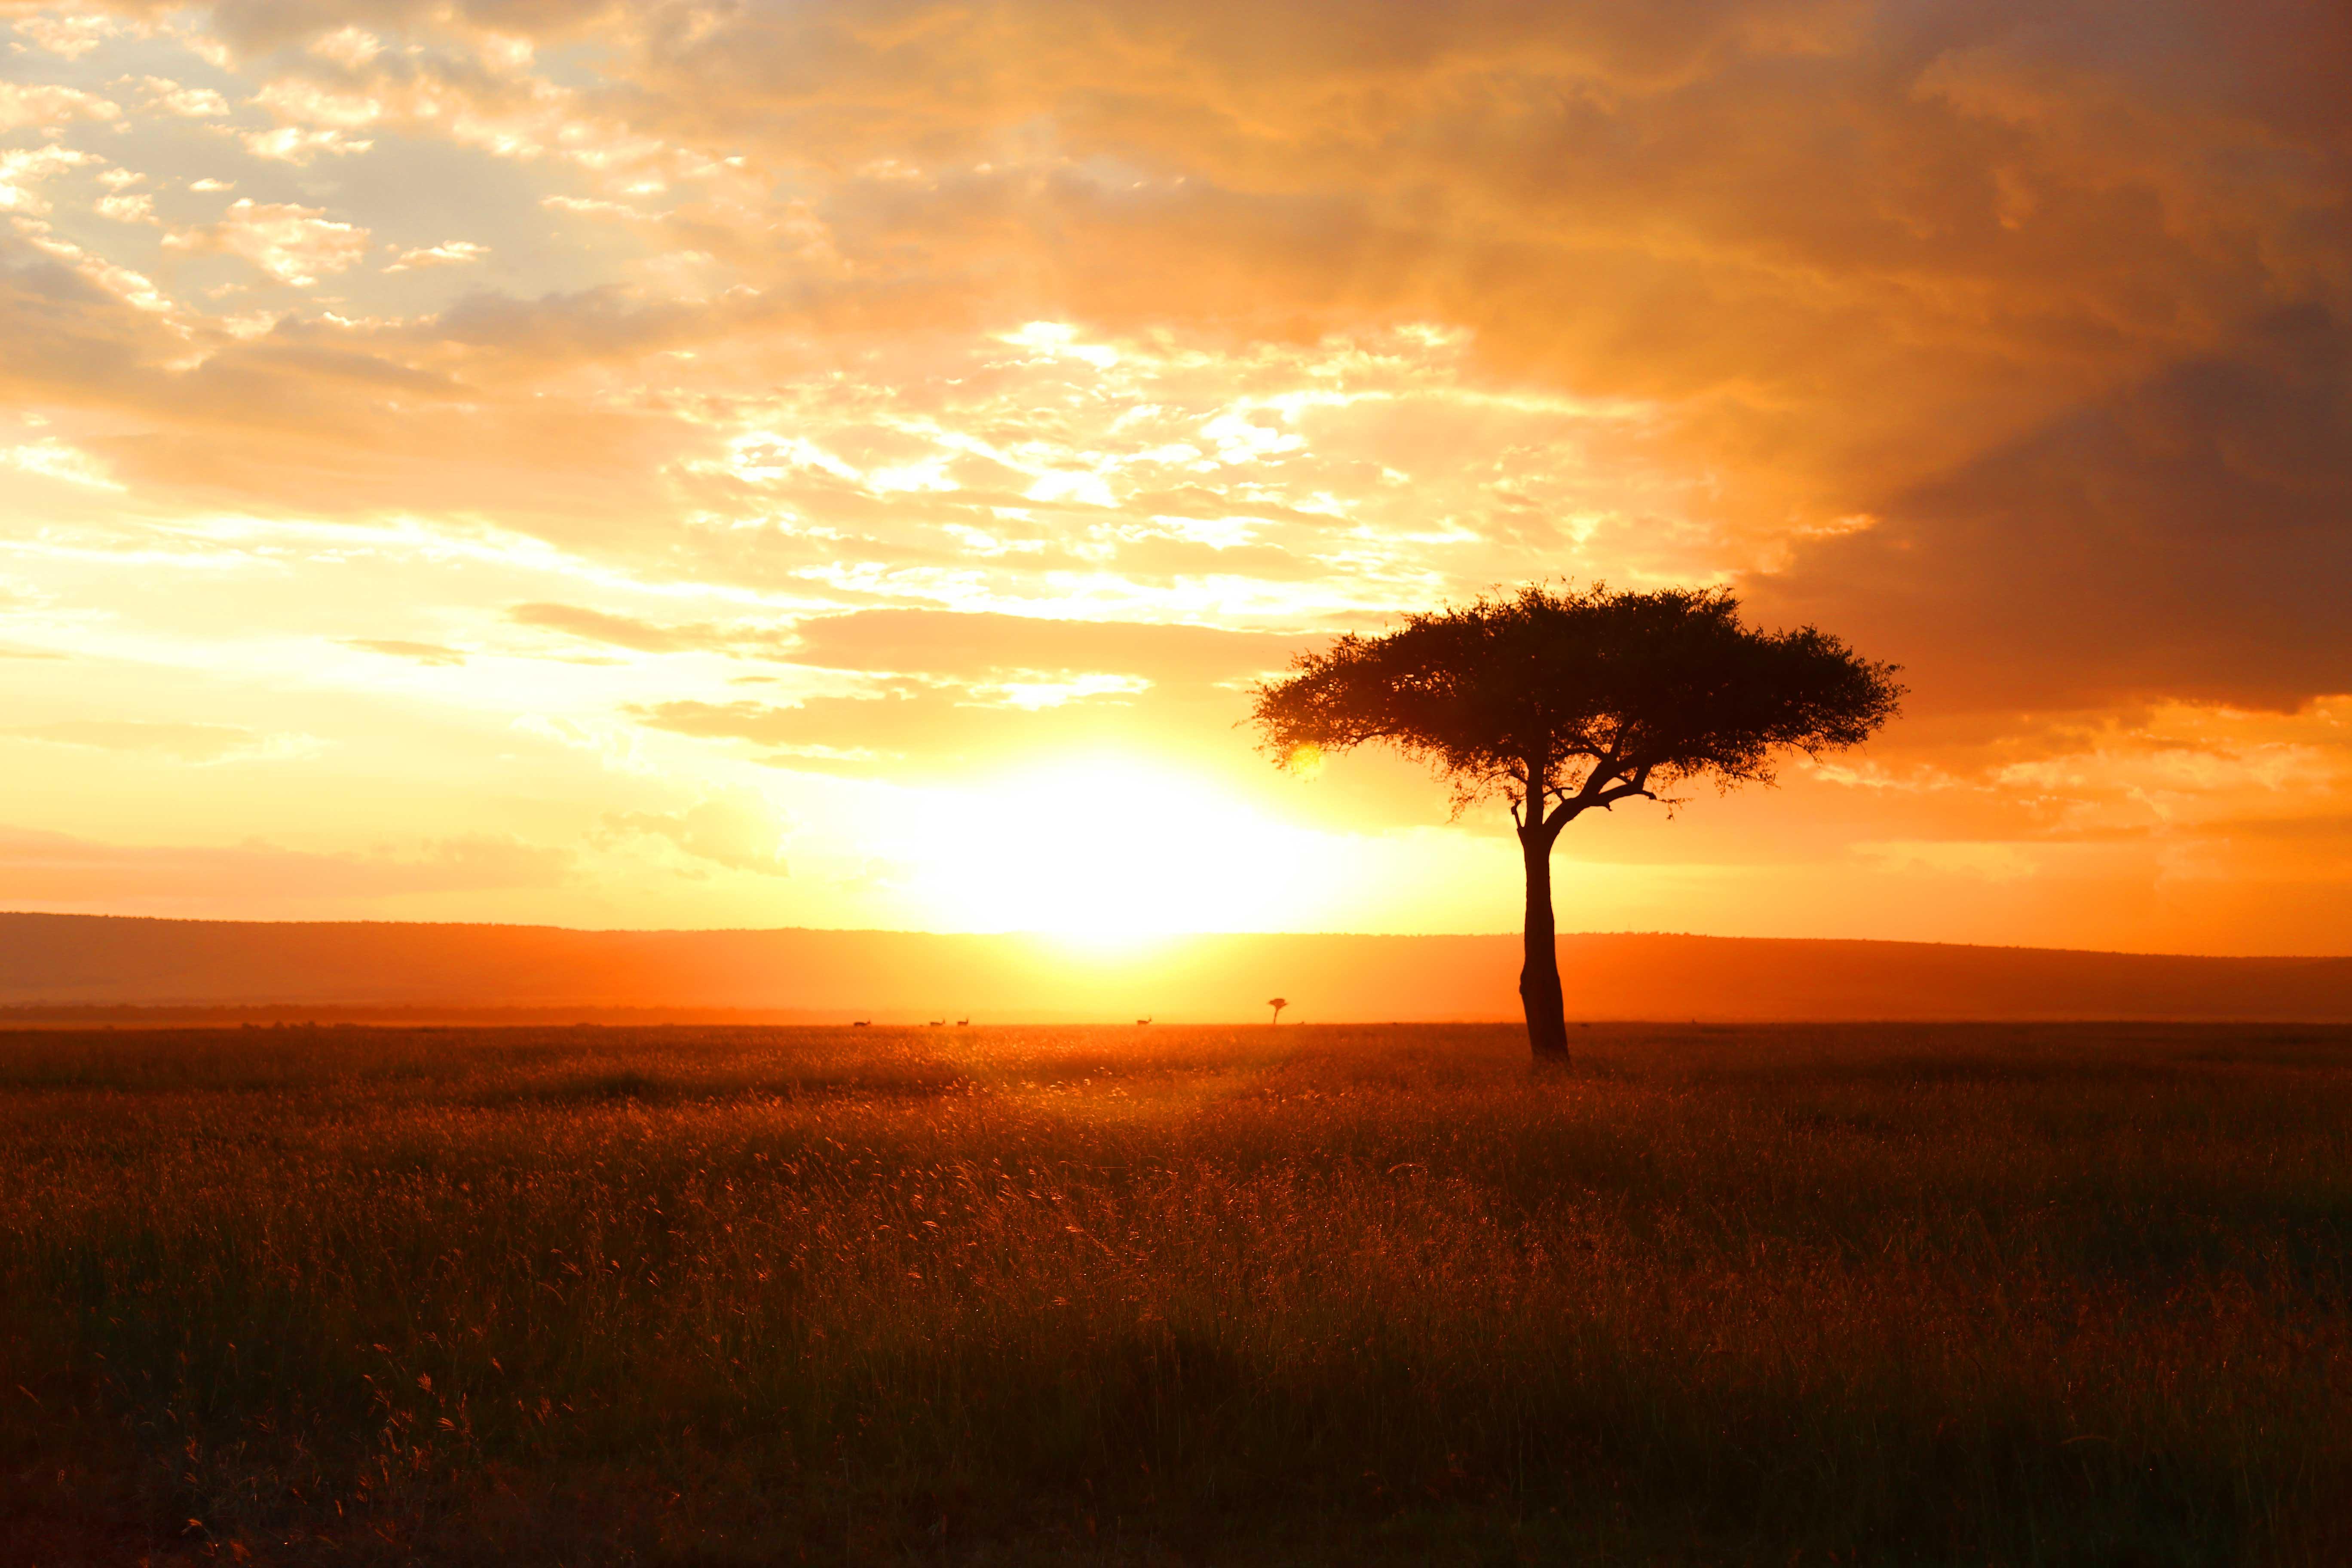 Masai Mara Sunset Worlds Best Safari Giraffe Long Neck Wild Lion March Pride Cheetah